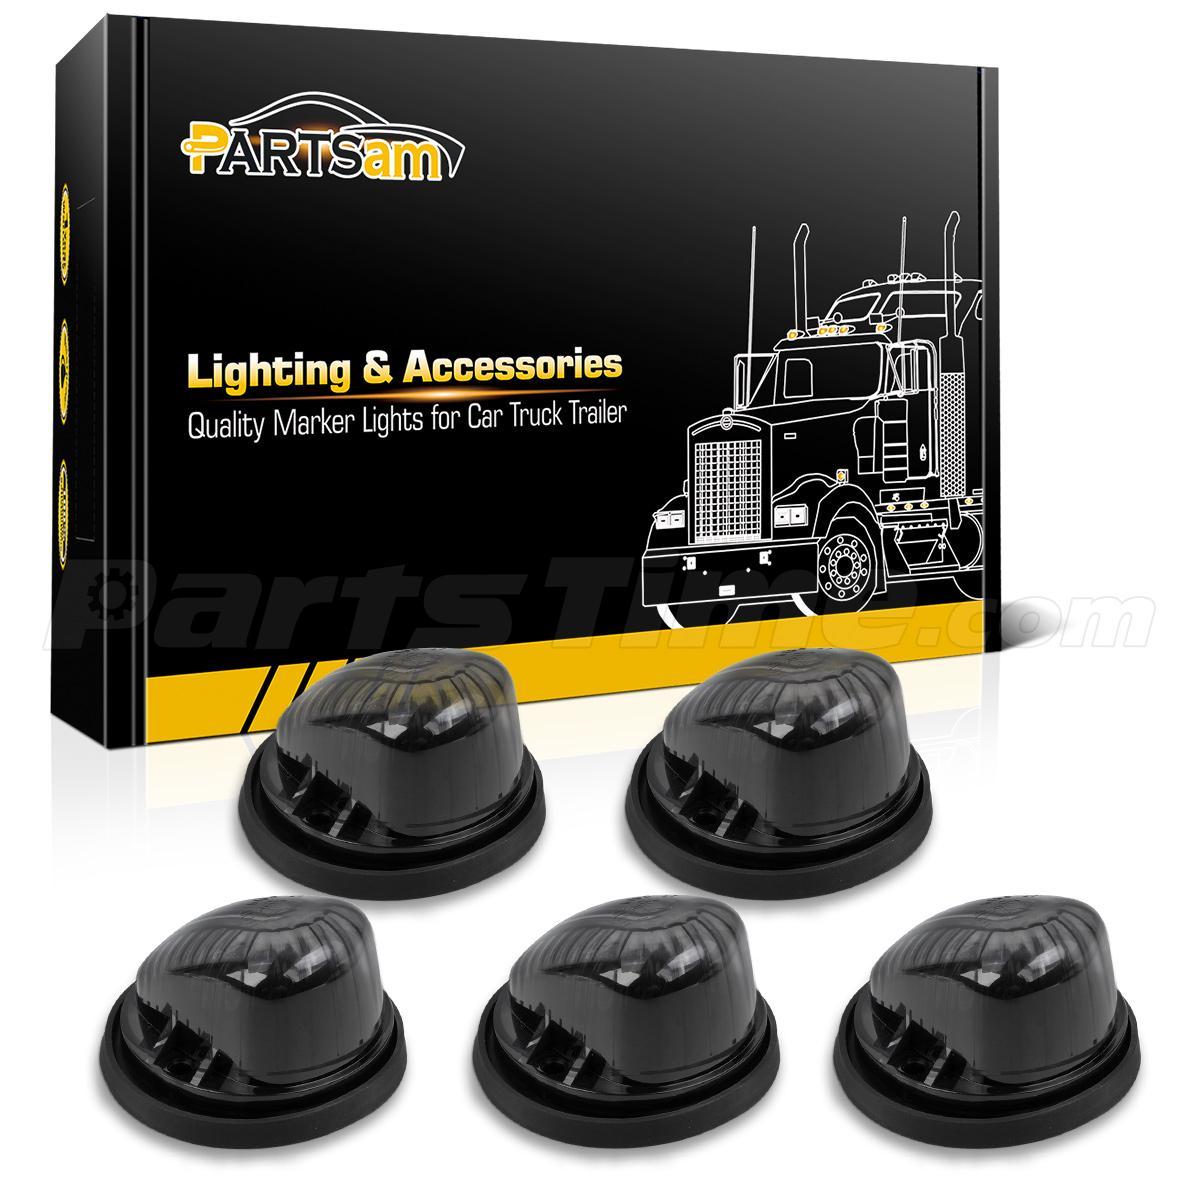 5 Roof Cab Marker Light Smoke Lens Cover 5xblack Base For